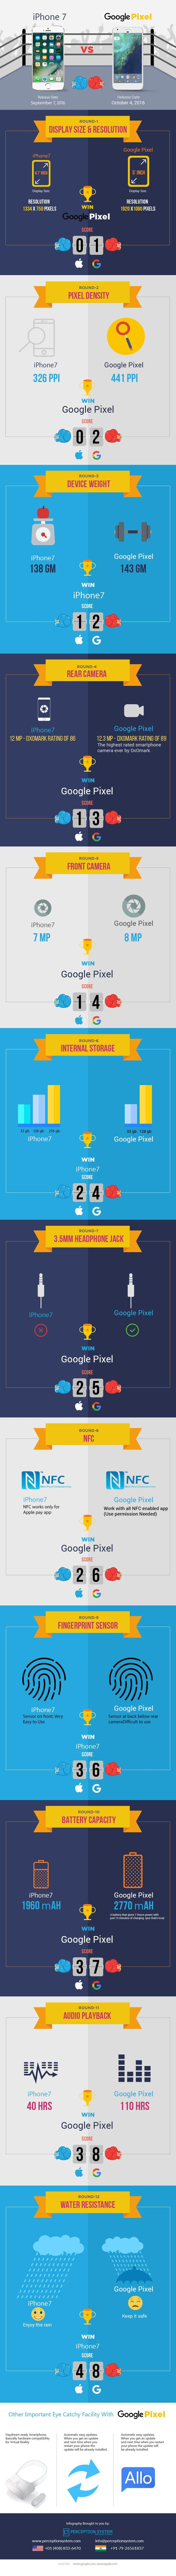 Google Pixel Vs iPhone 7: Big Fight (Who Win?) – Infographic http://blogs.perceptionsystem.com/infographic/google-pixel-vs-iphone-7-comparison/    #infographic #iphone7 #googlepixel #mobile #tech #iphone #googlepixel